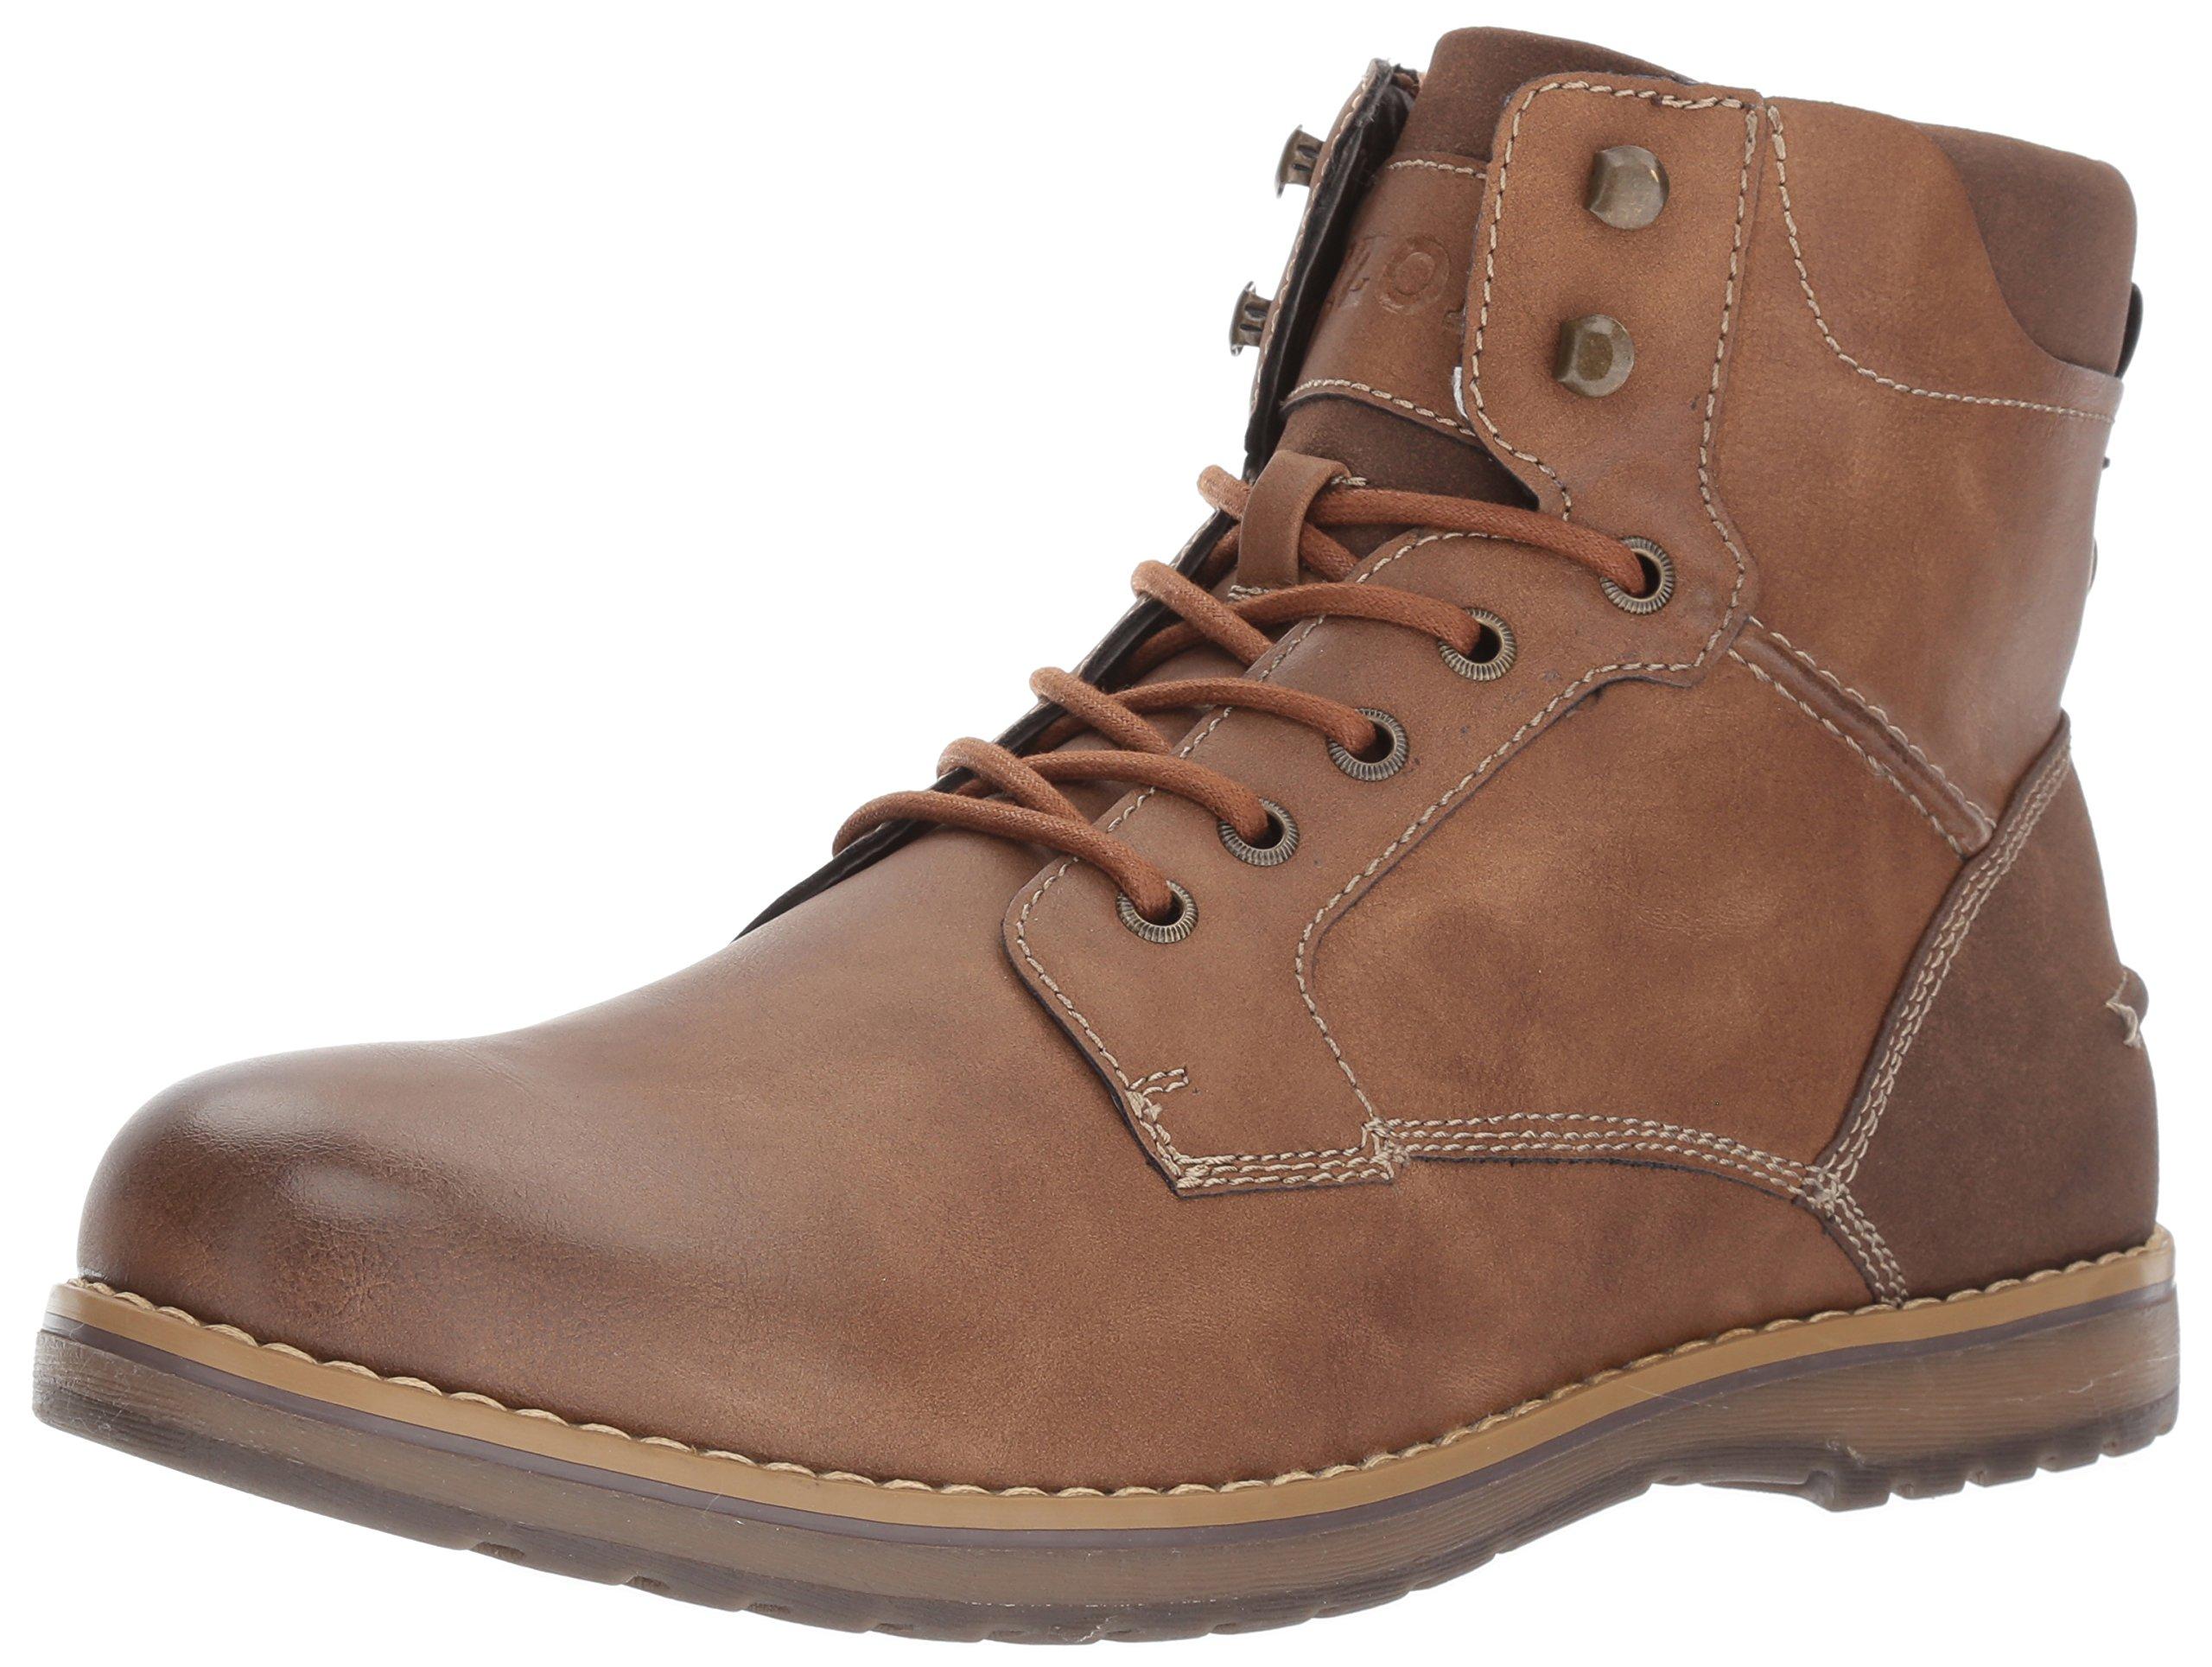 IZOD Men's Leon Ankle Boot, Tan, 11 Medium US